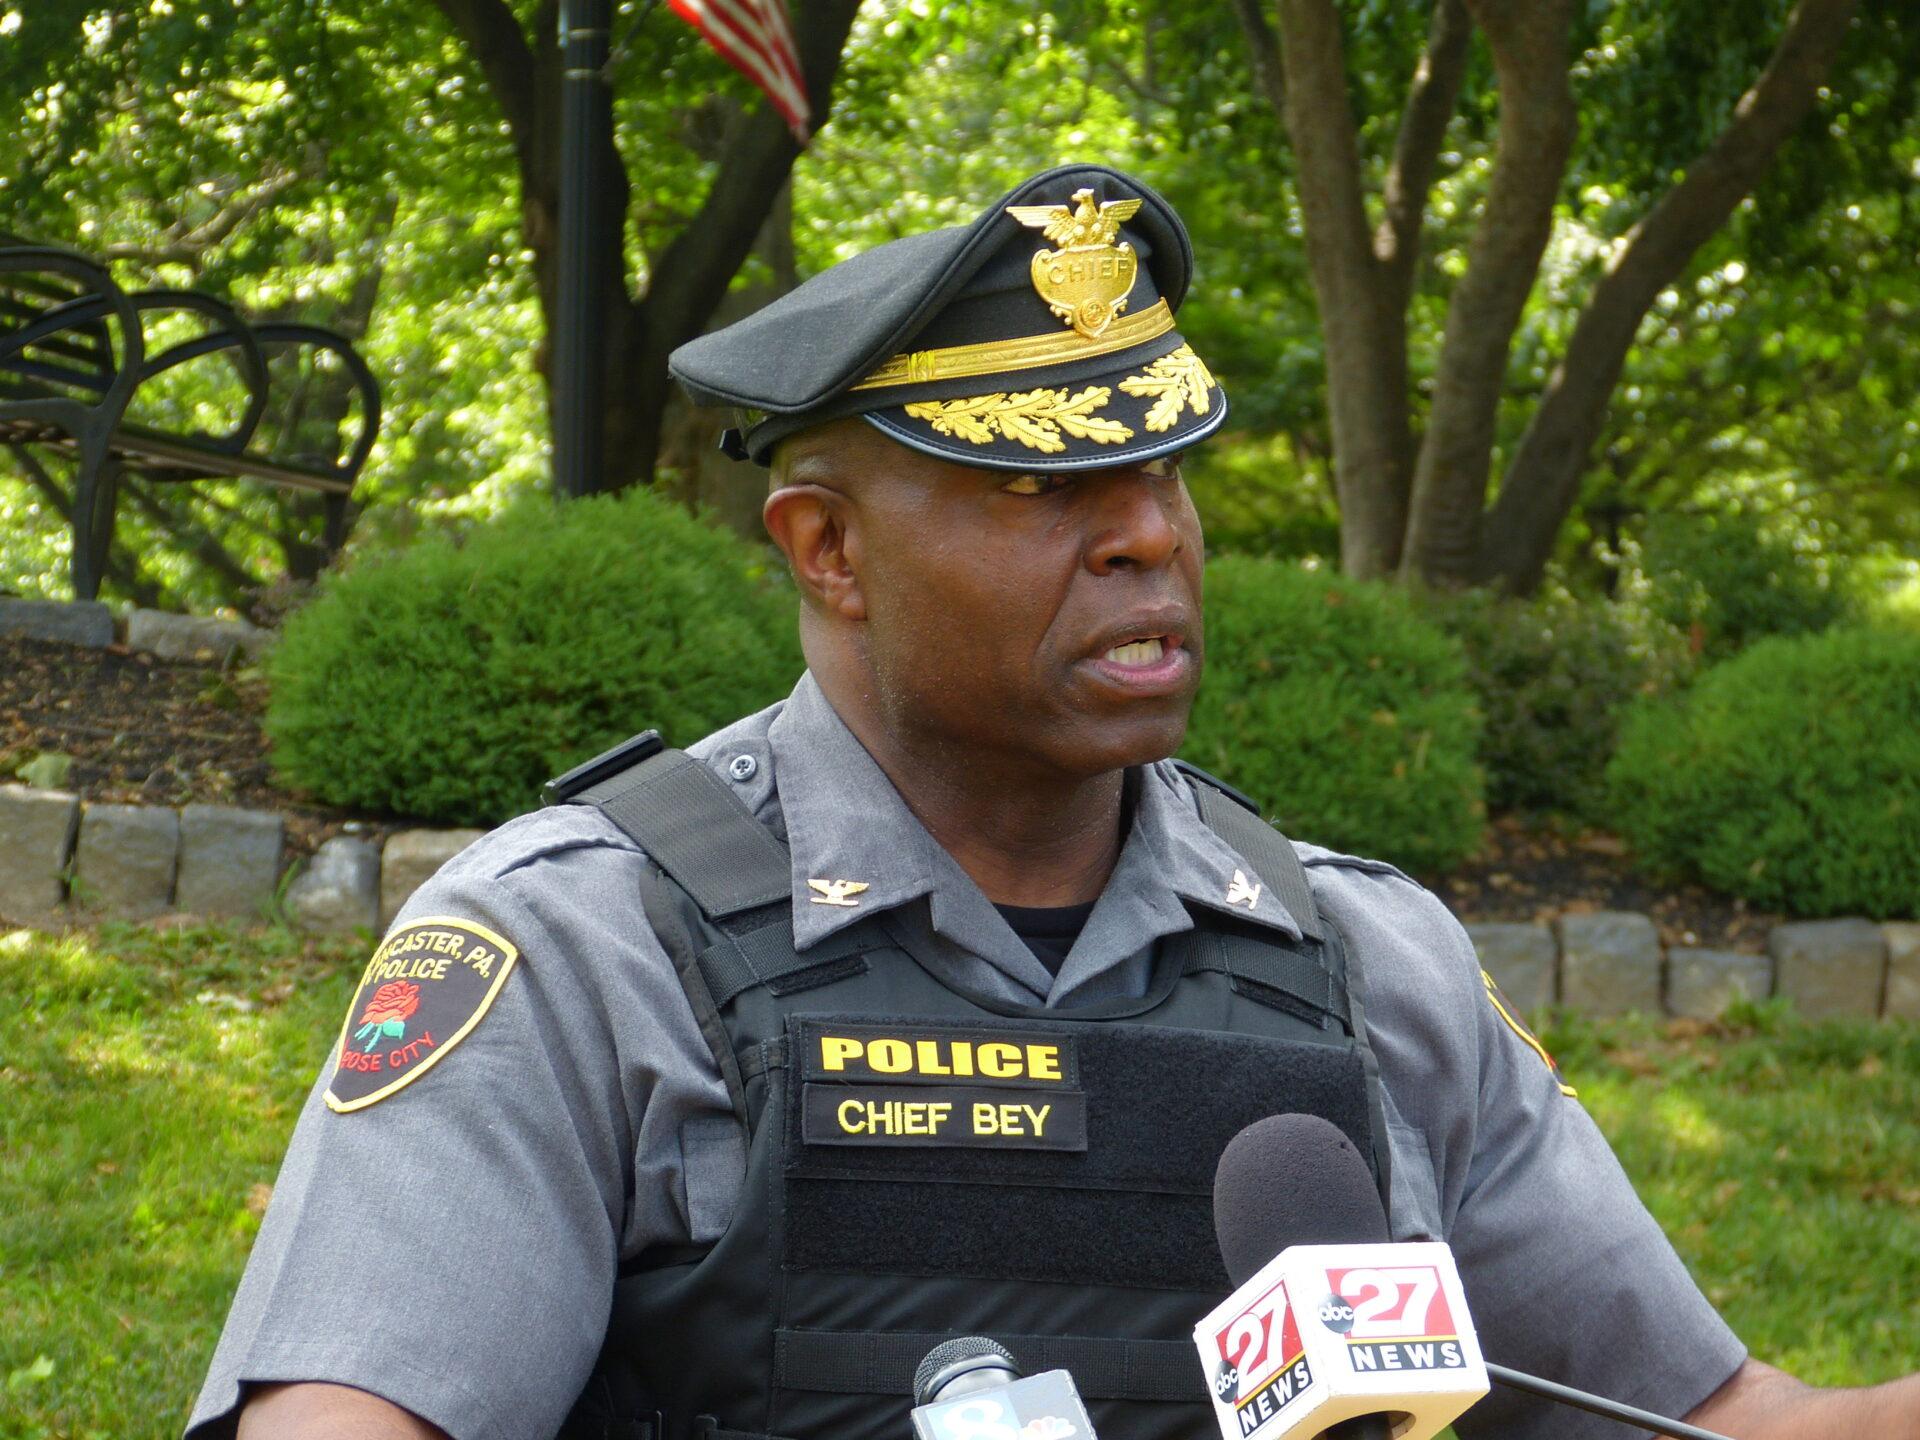 Chief Bey pledges to build trust